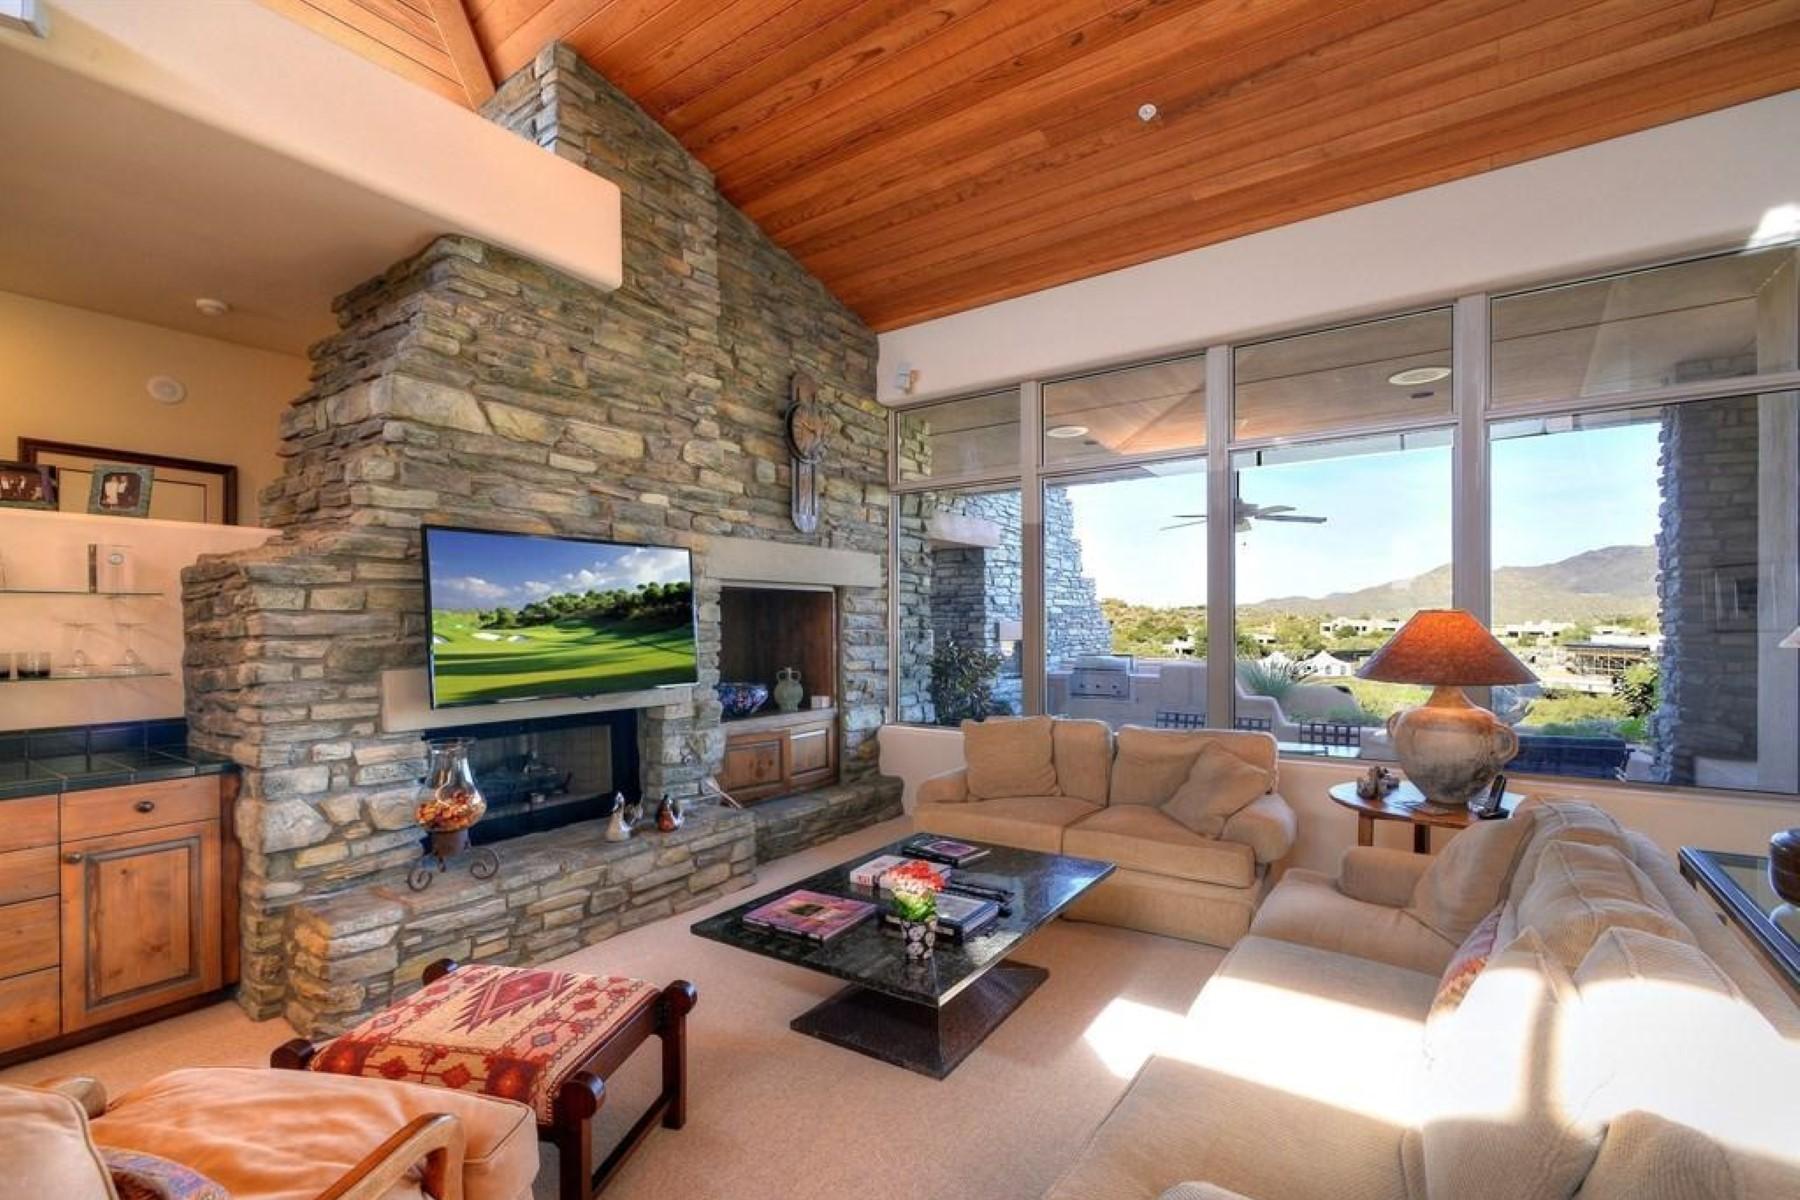 Single Family Home for Sale at Village of Sonoran Ridge 10148 E Old Trail Rd, Scottsdale, Arizona, 85262 United States